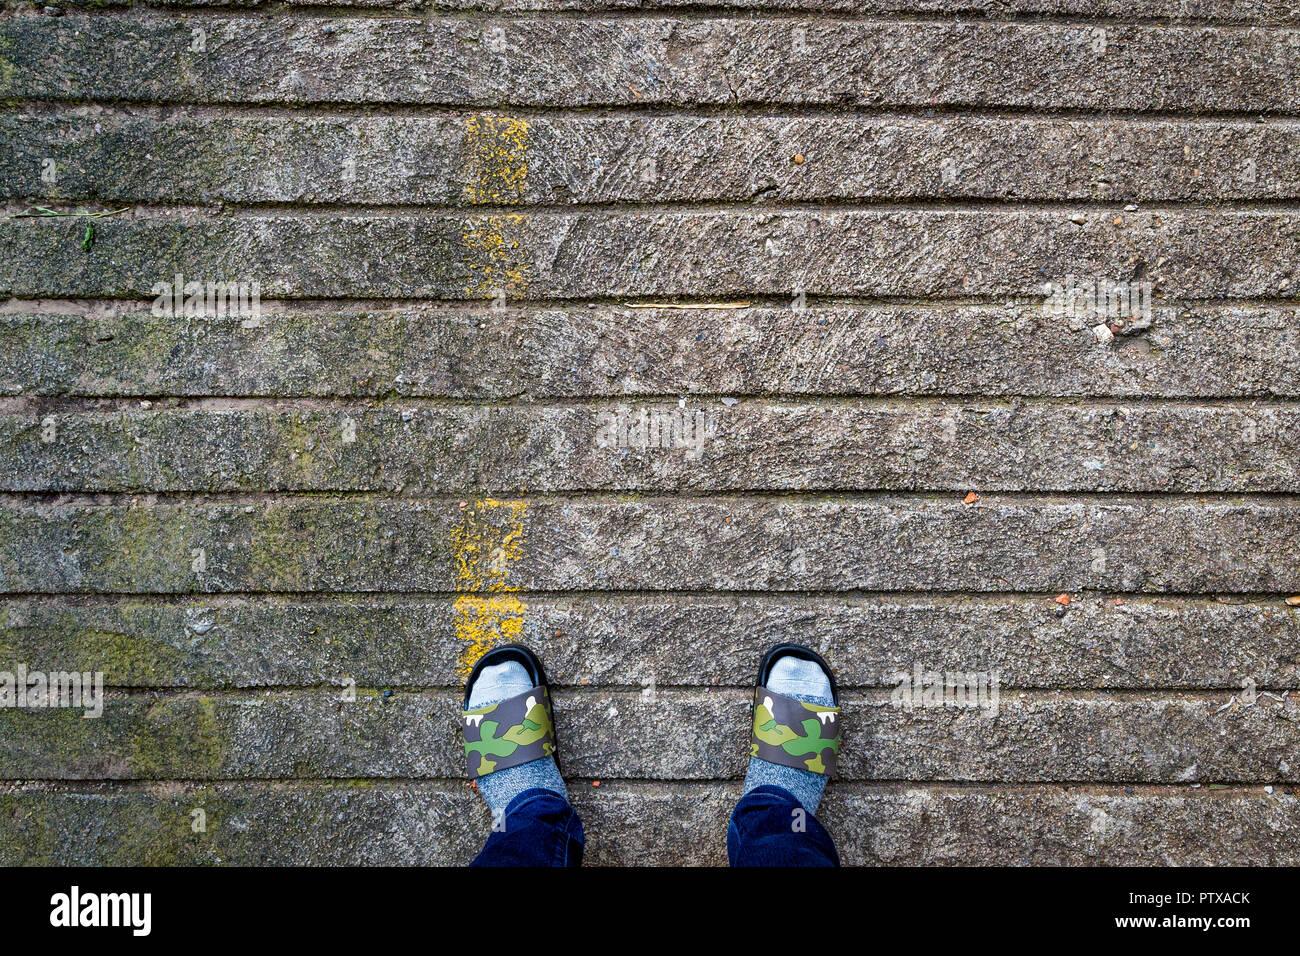 Socked Slippered Feet On Stone Pavement - Stock Image